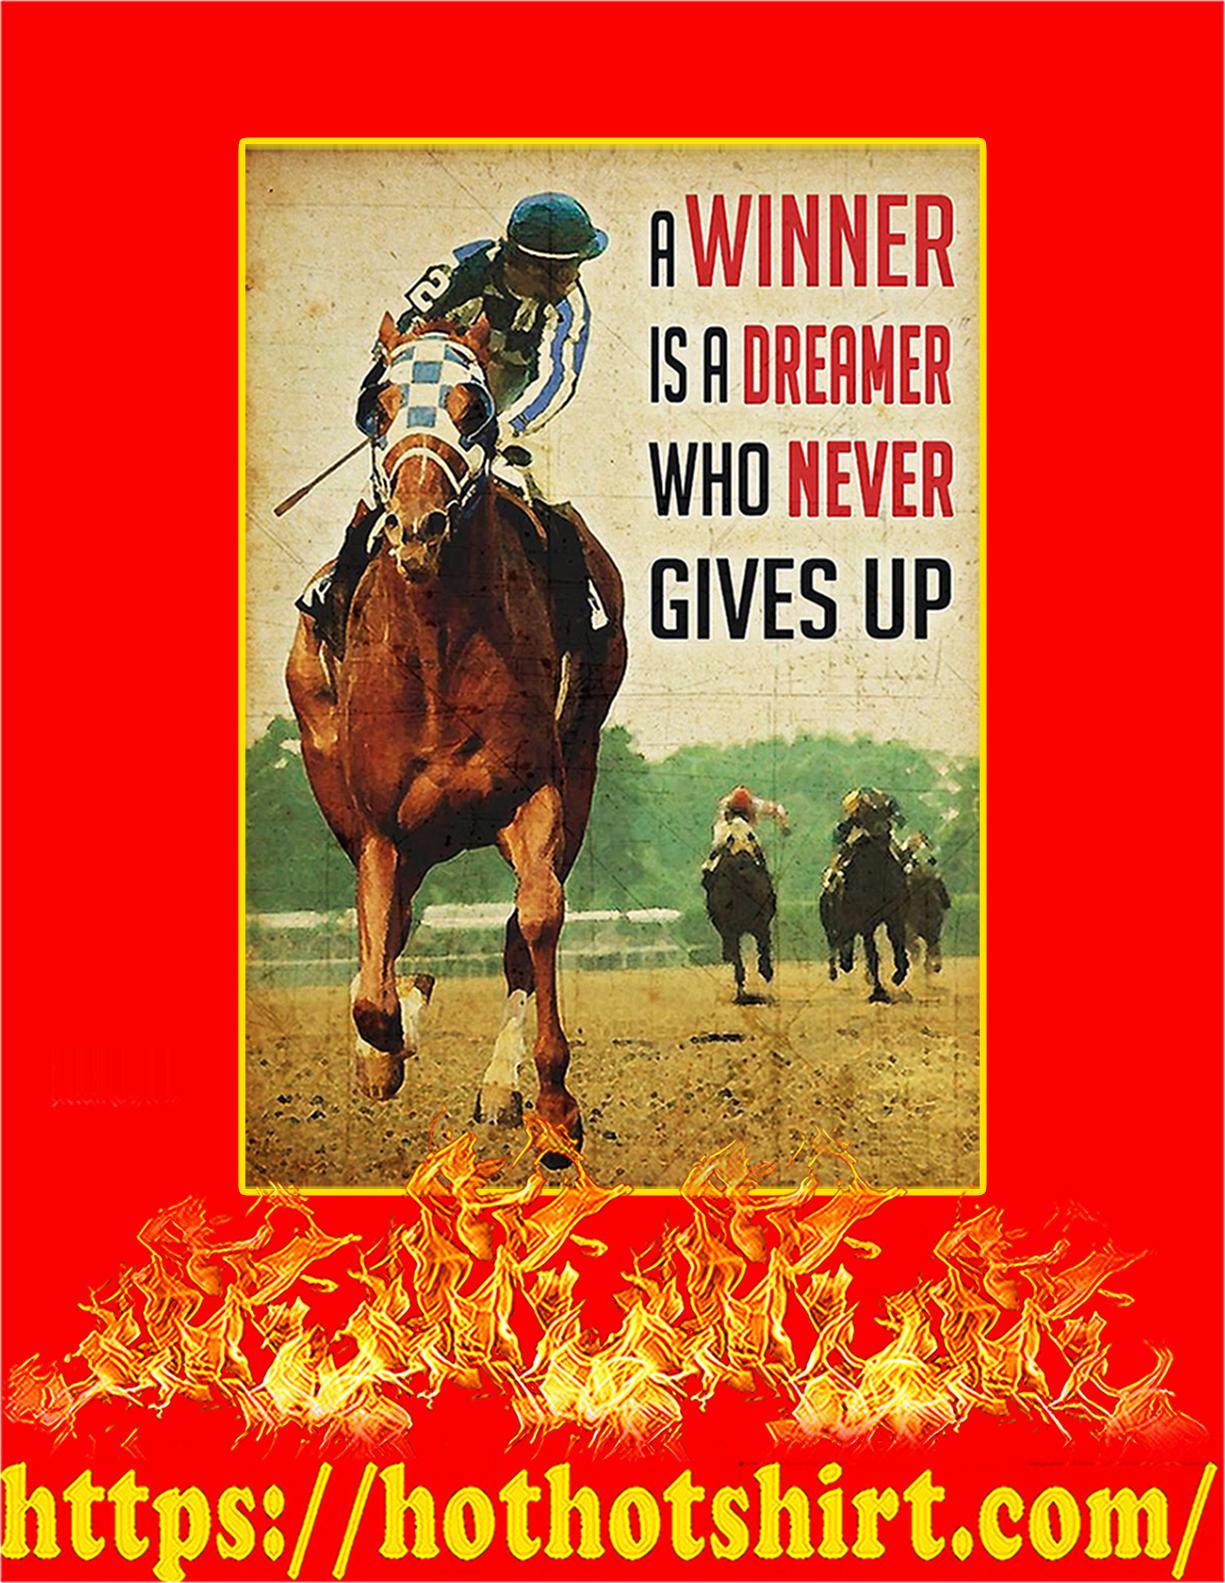 Horse racing A winner is a dreamer poster - A4